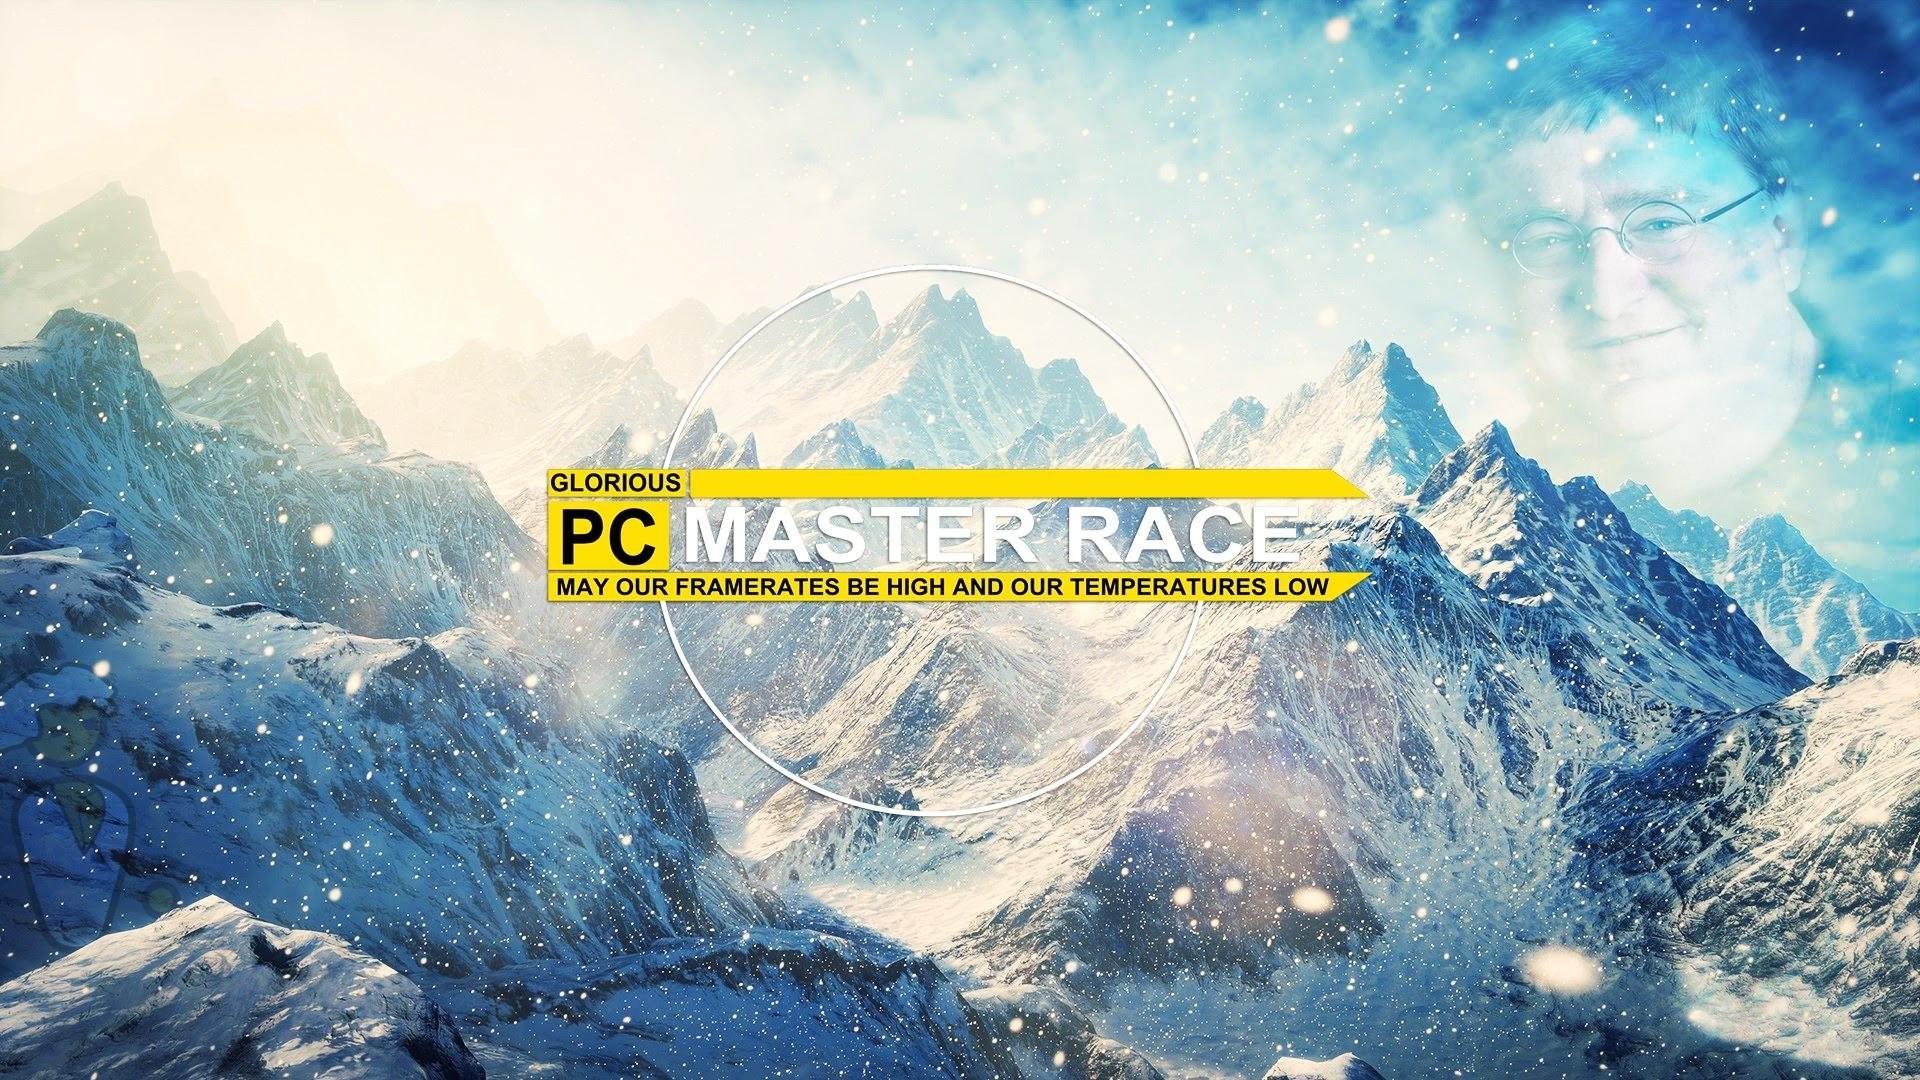 Video Game – PC Gaming Bakgrund. Ladda ner! Next Wallpaper · FöregÃ¥ende  bakgrundsbild. PC MASTER RACE